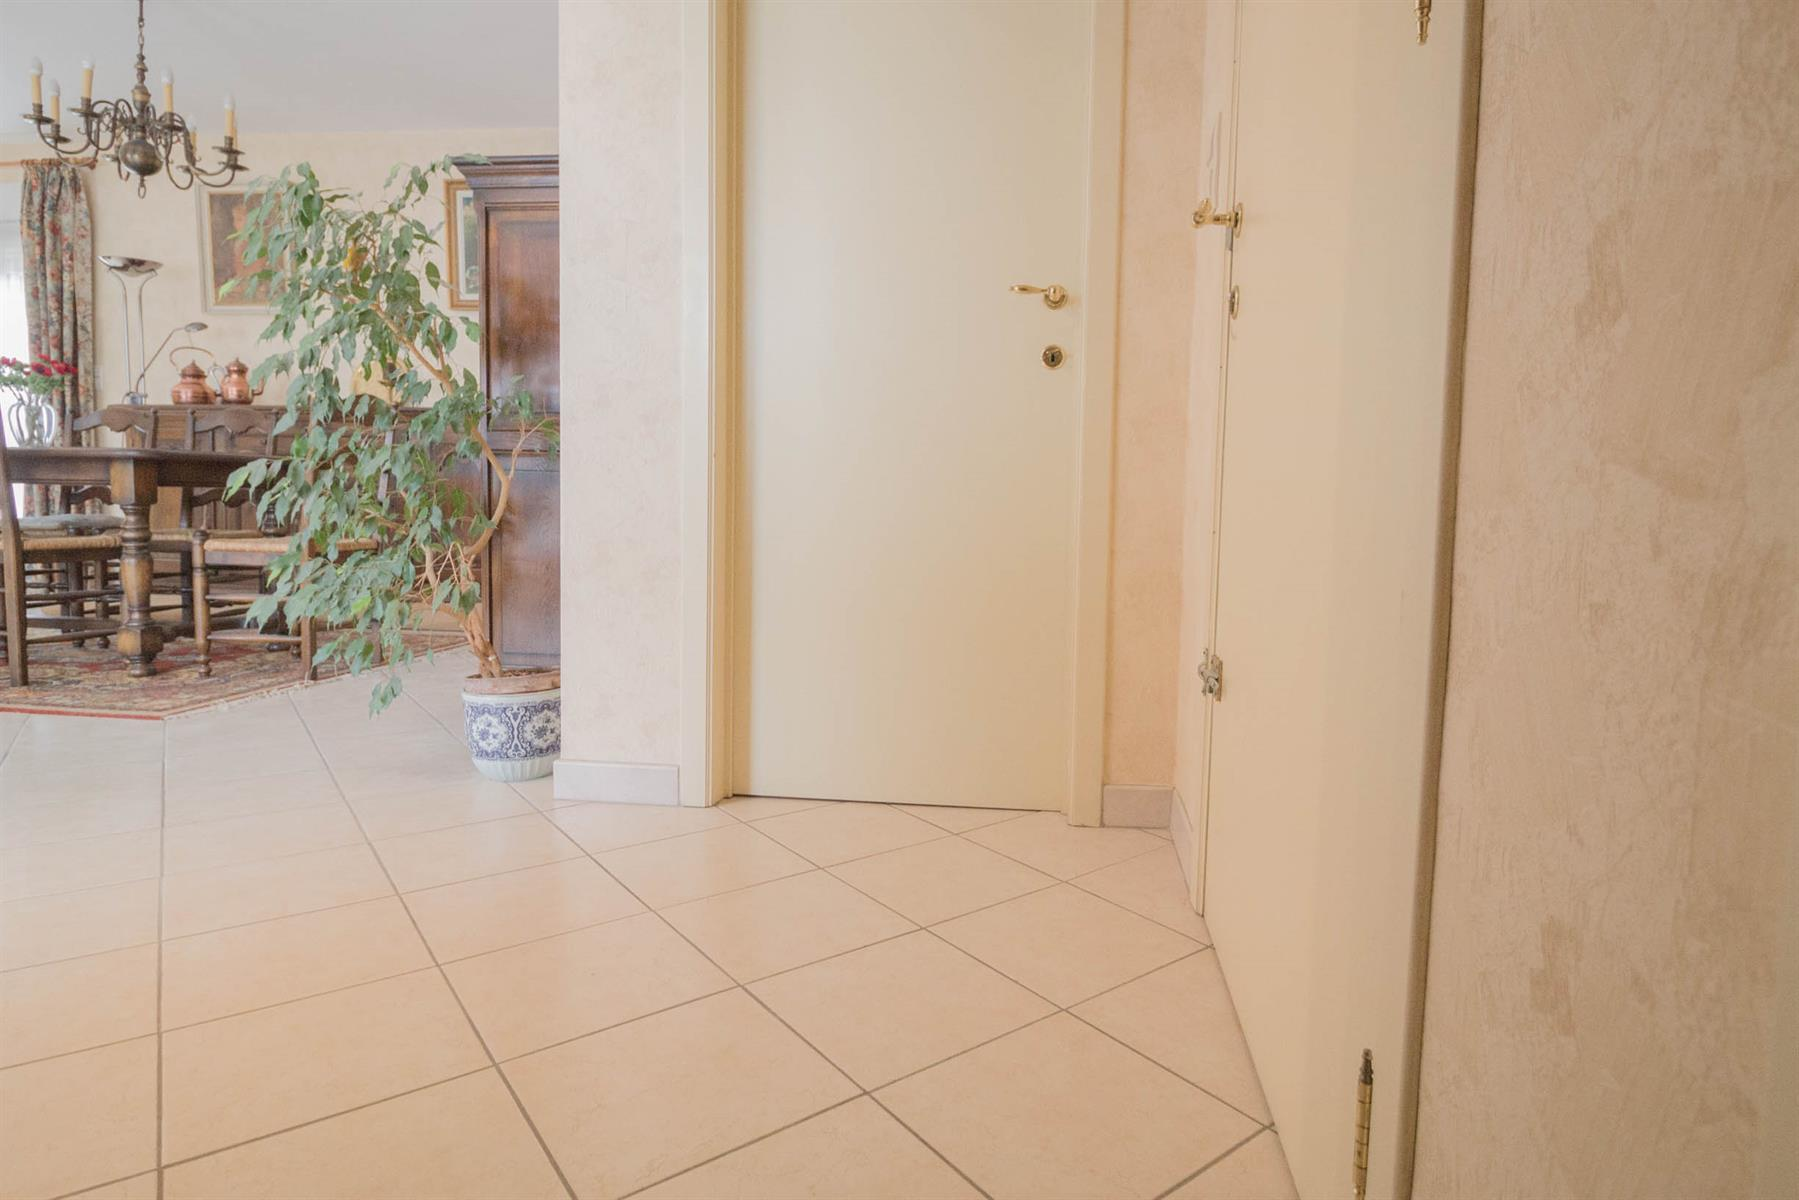 Appartement - Trazegnies - #4359277-6